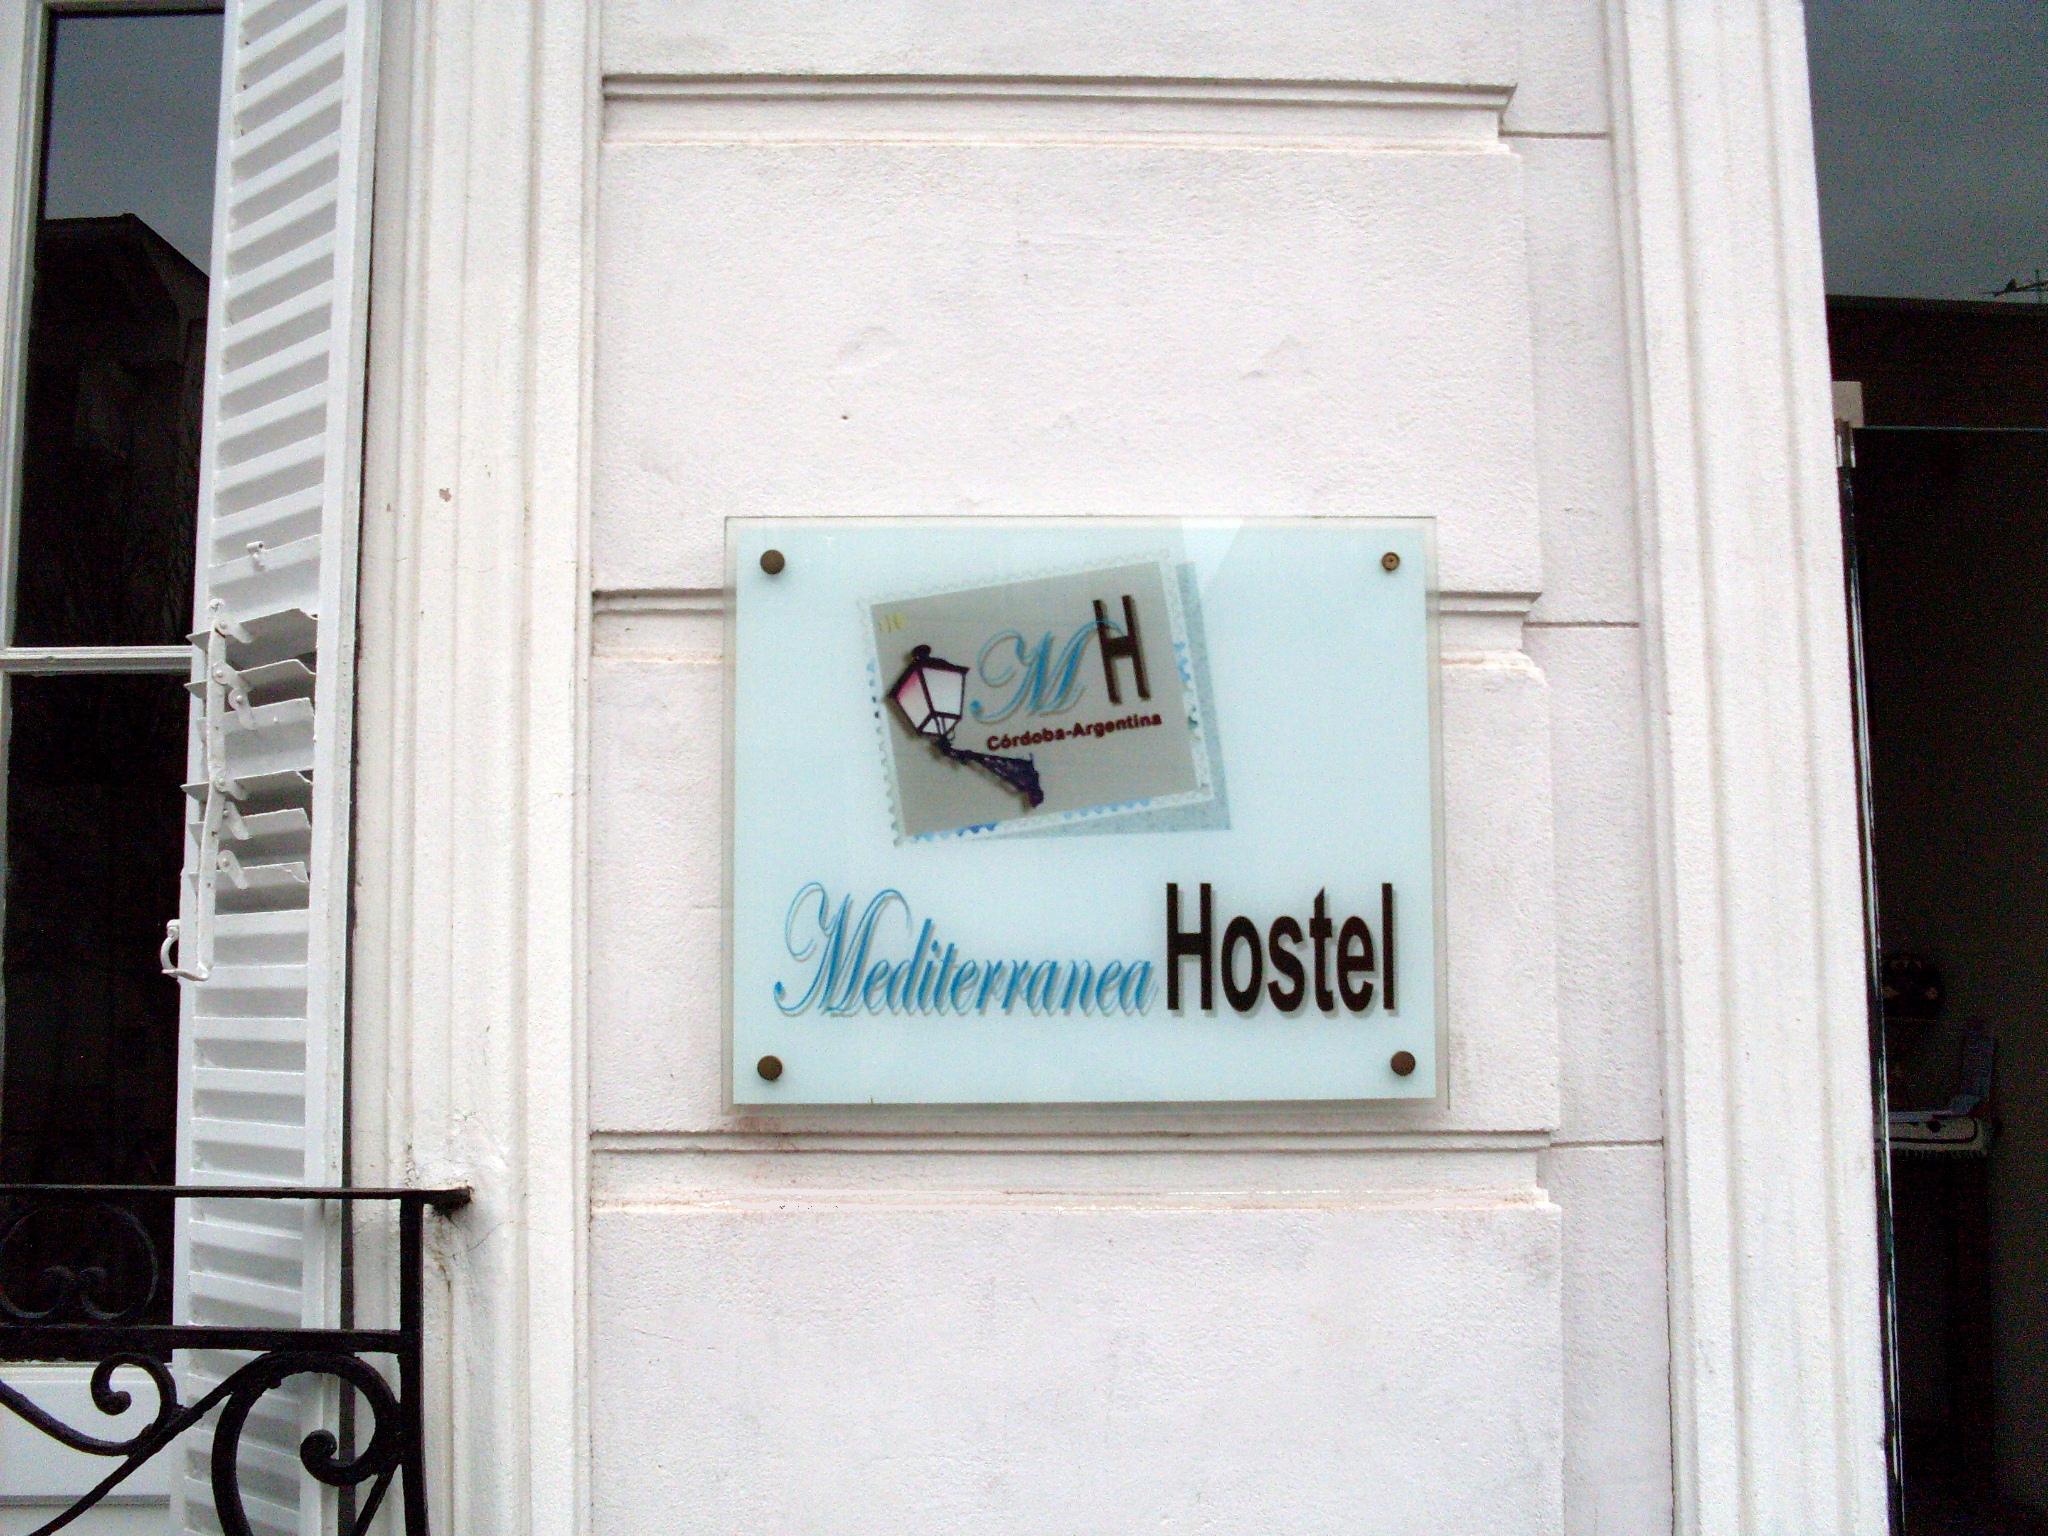 Mediterranea Hostel